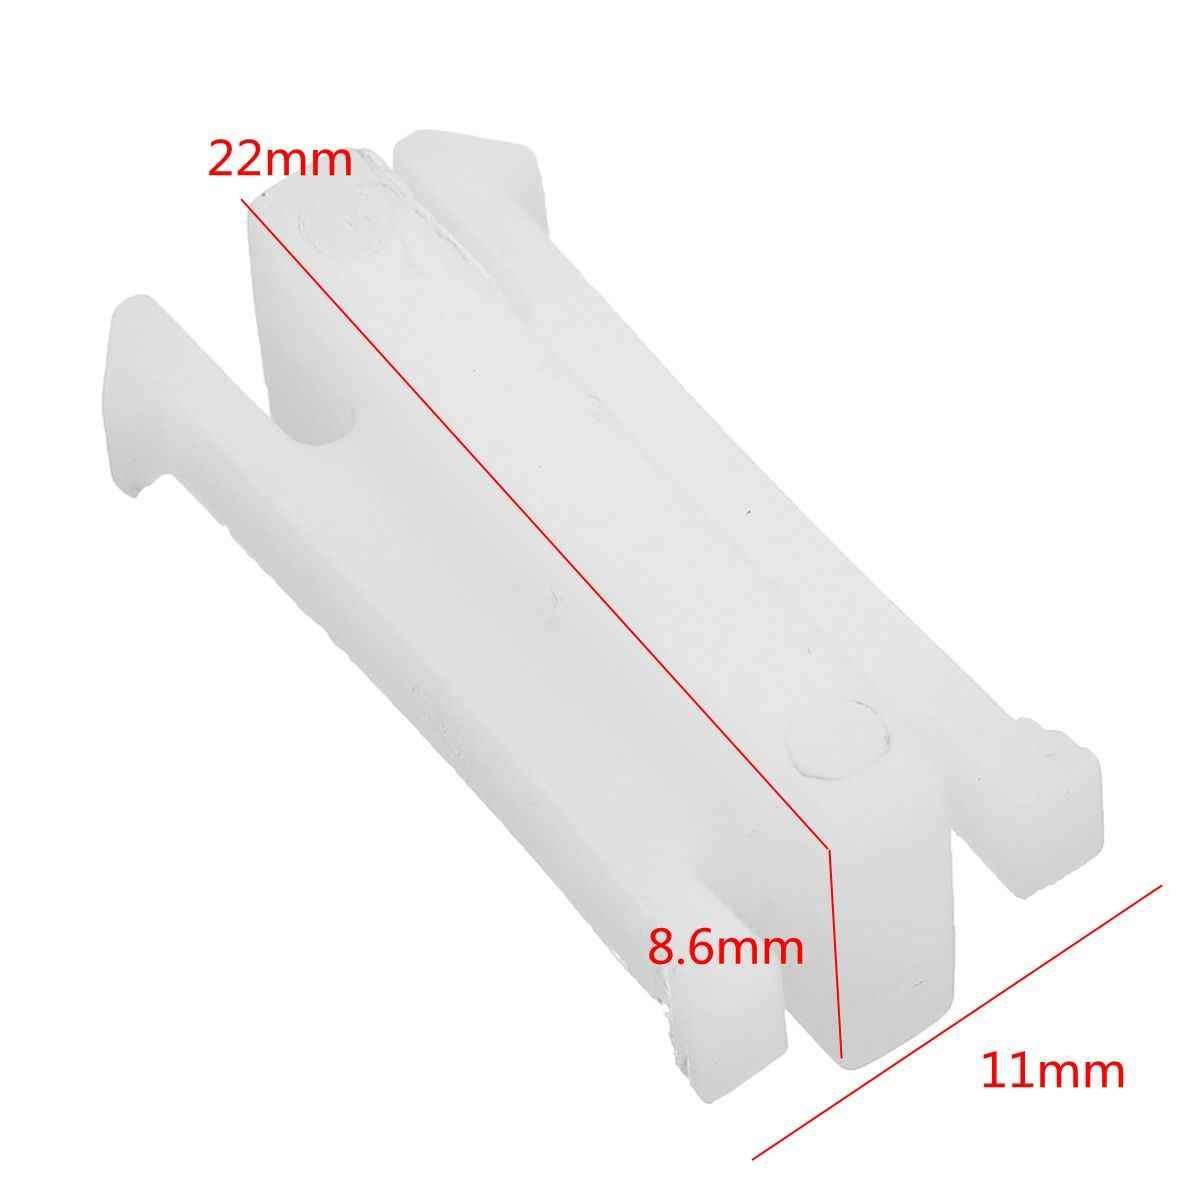 Bonnet Lock Menangkap Klip Kabel 4549268 3M5A 16A948AB untuk Ford untuk Fokus/C-MAX 2004-2011 3M5A 16A948AB